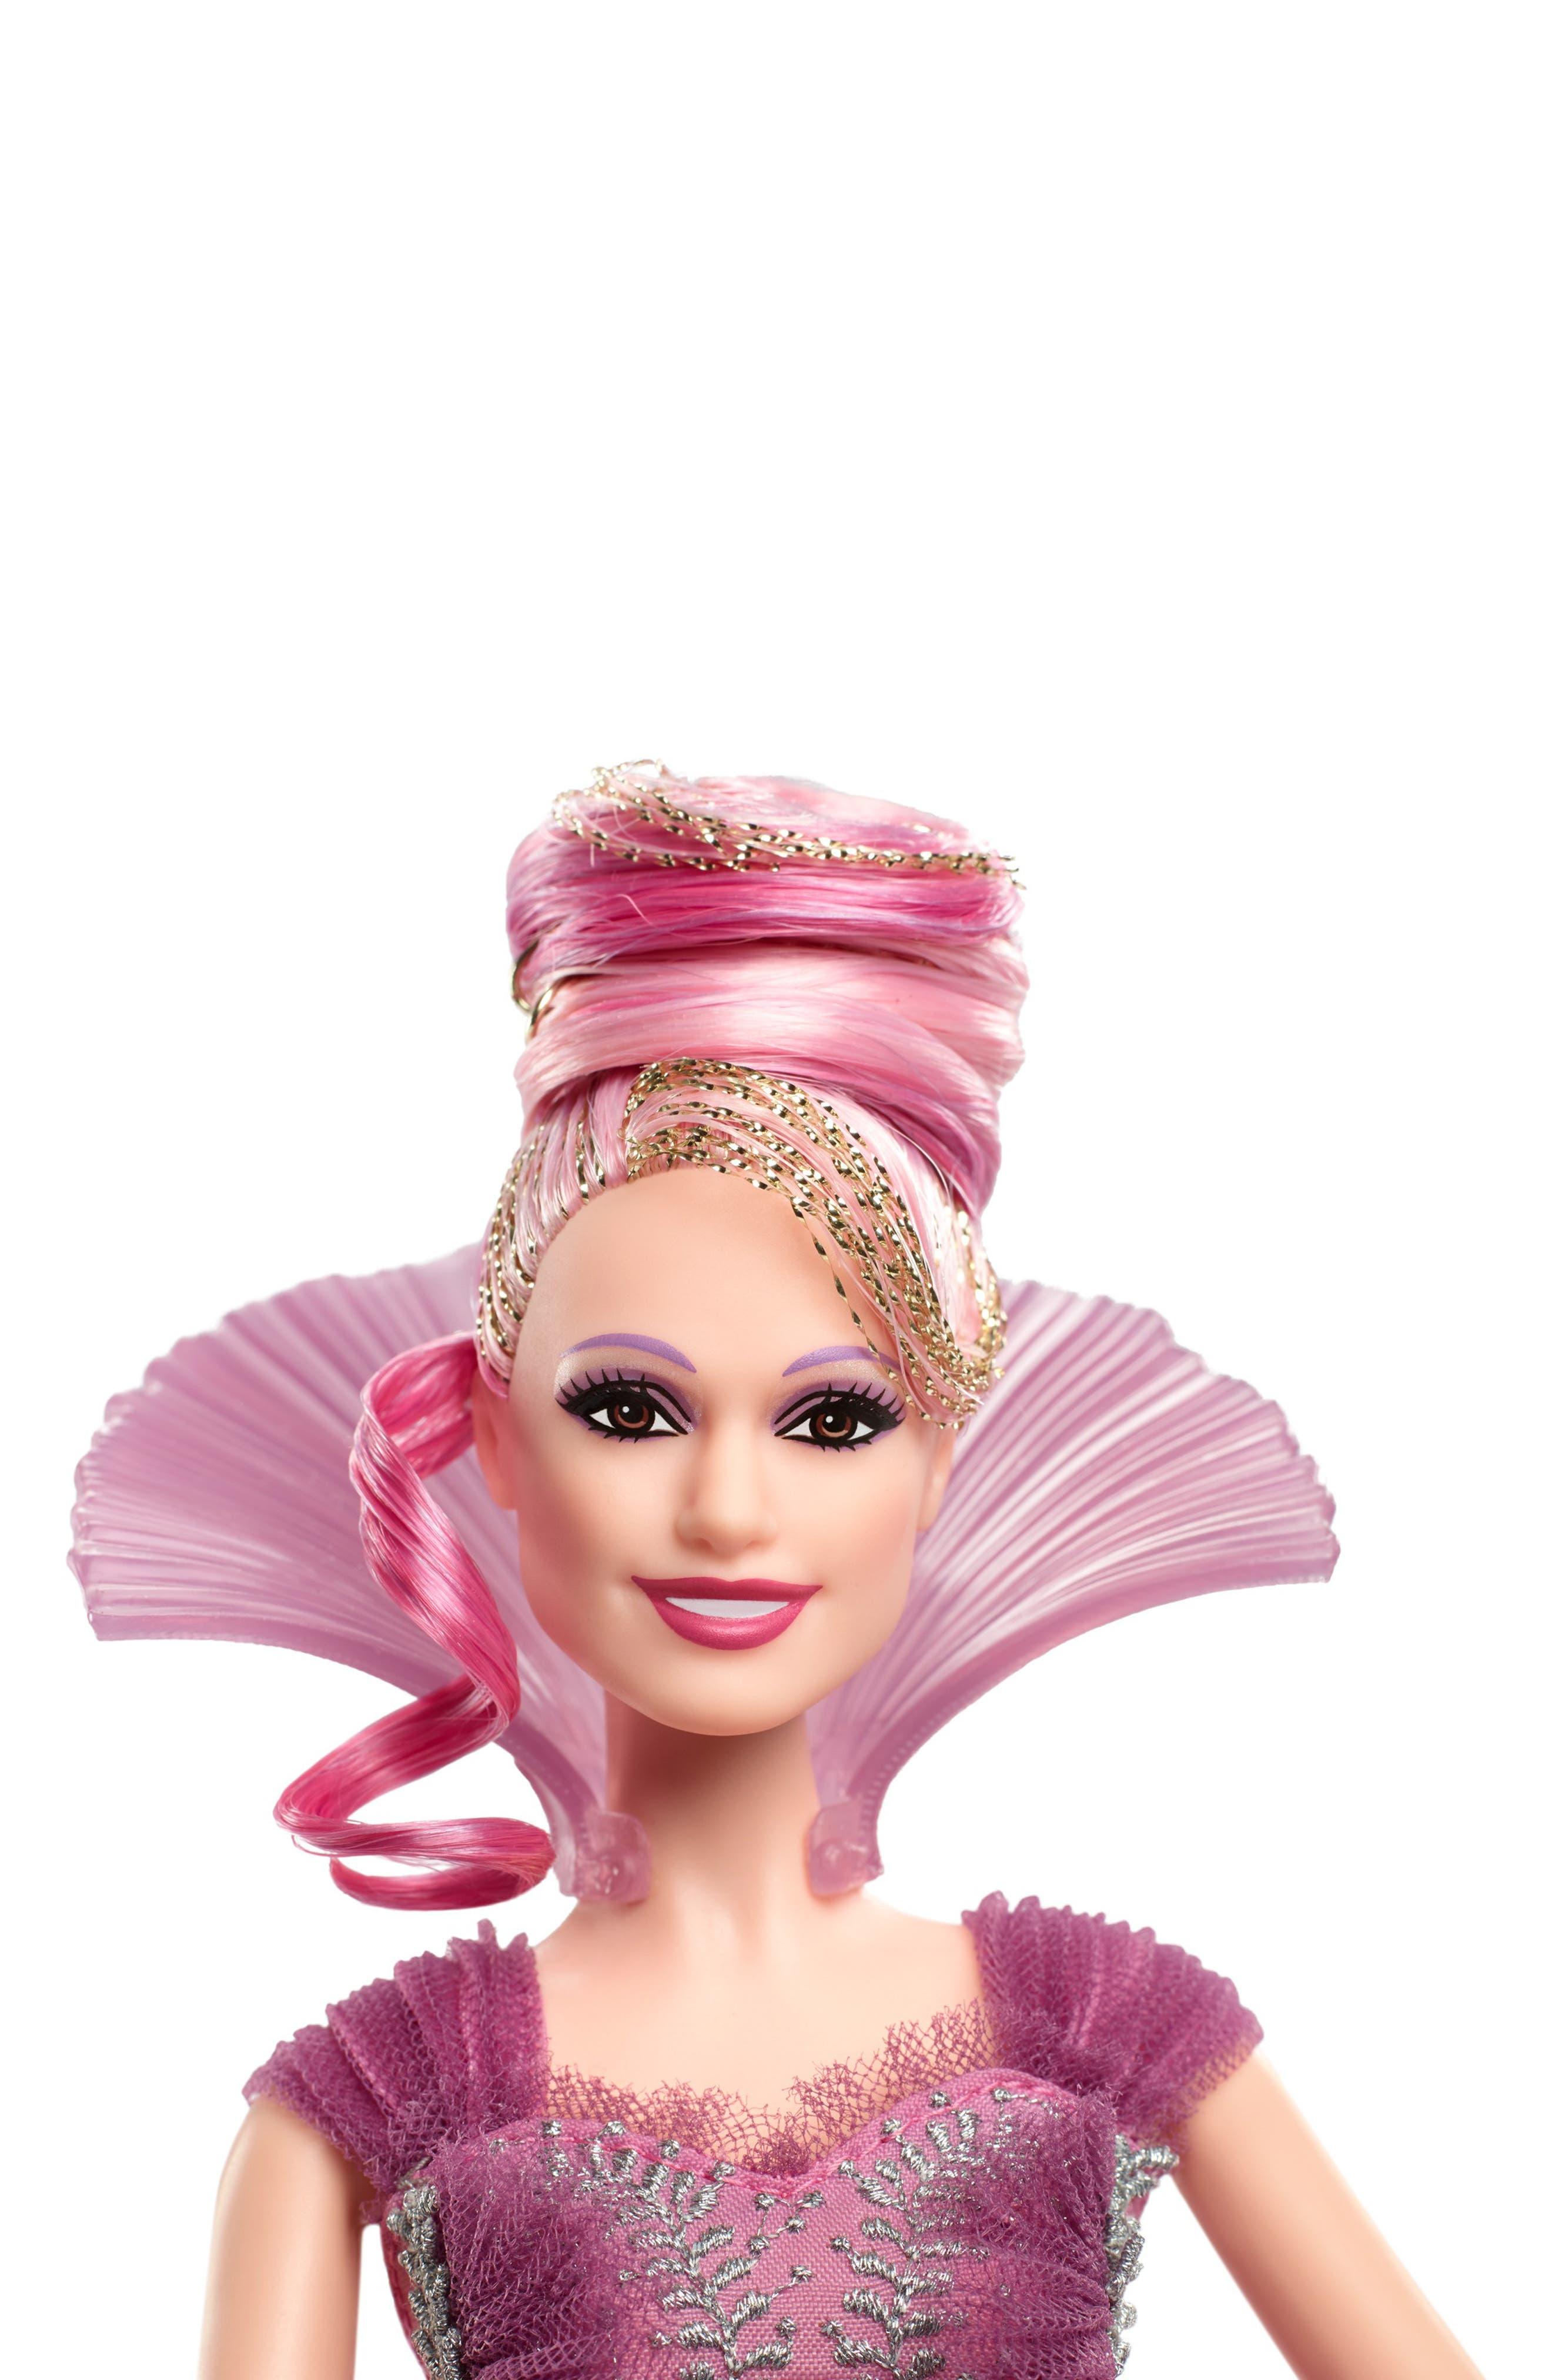 MATTEL,                             Disney<sup>®</sup> The Nutcracker & the Four Realms Sugar Plum Fairy Barbie<sup>®</sup> Doll,                             Alternate thumbnail 5, color,                             960